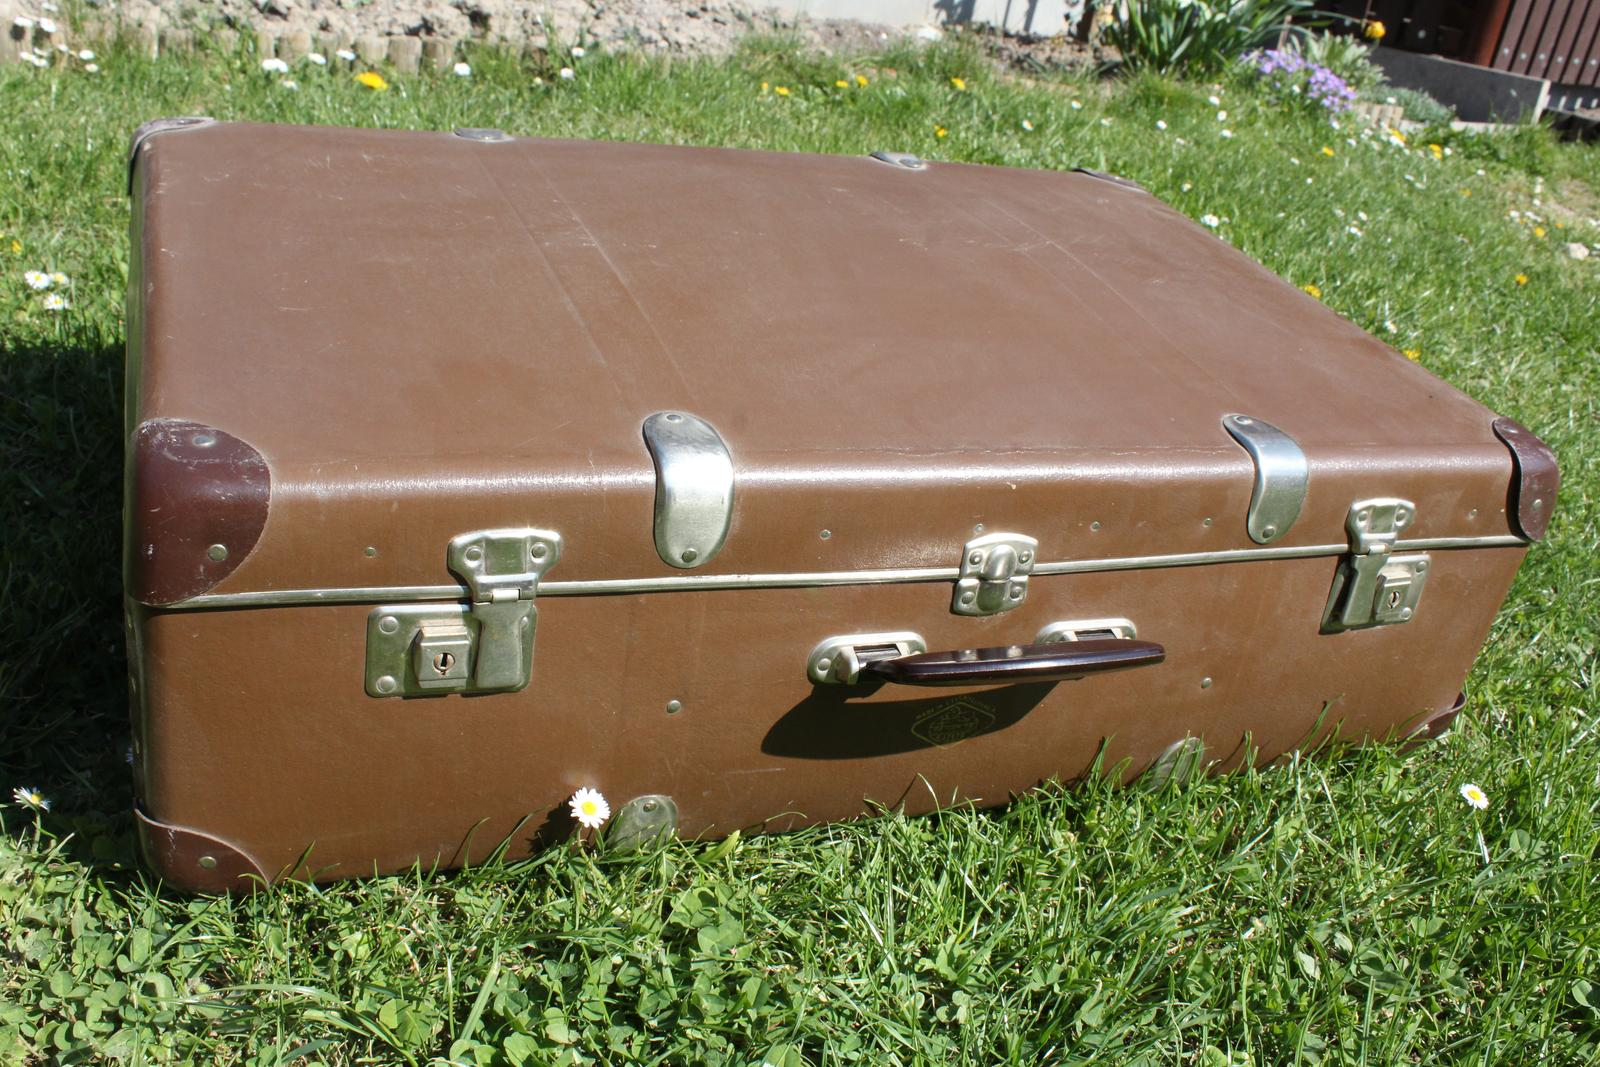 Retro kufr - Obrázek č. 1